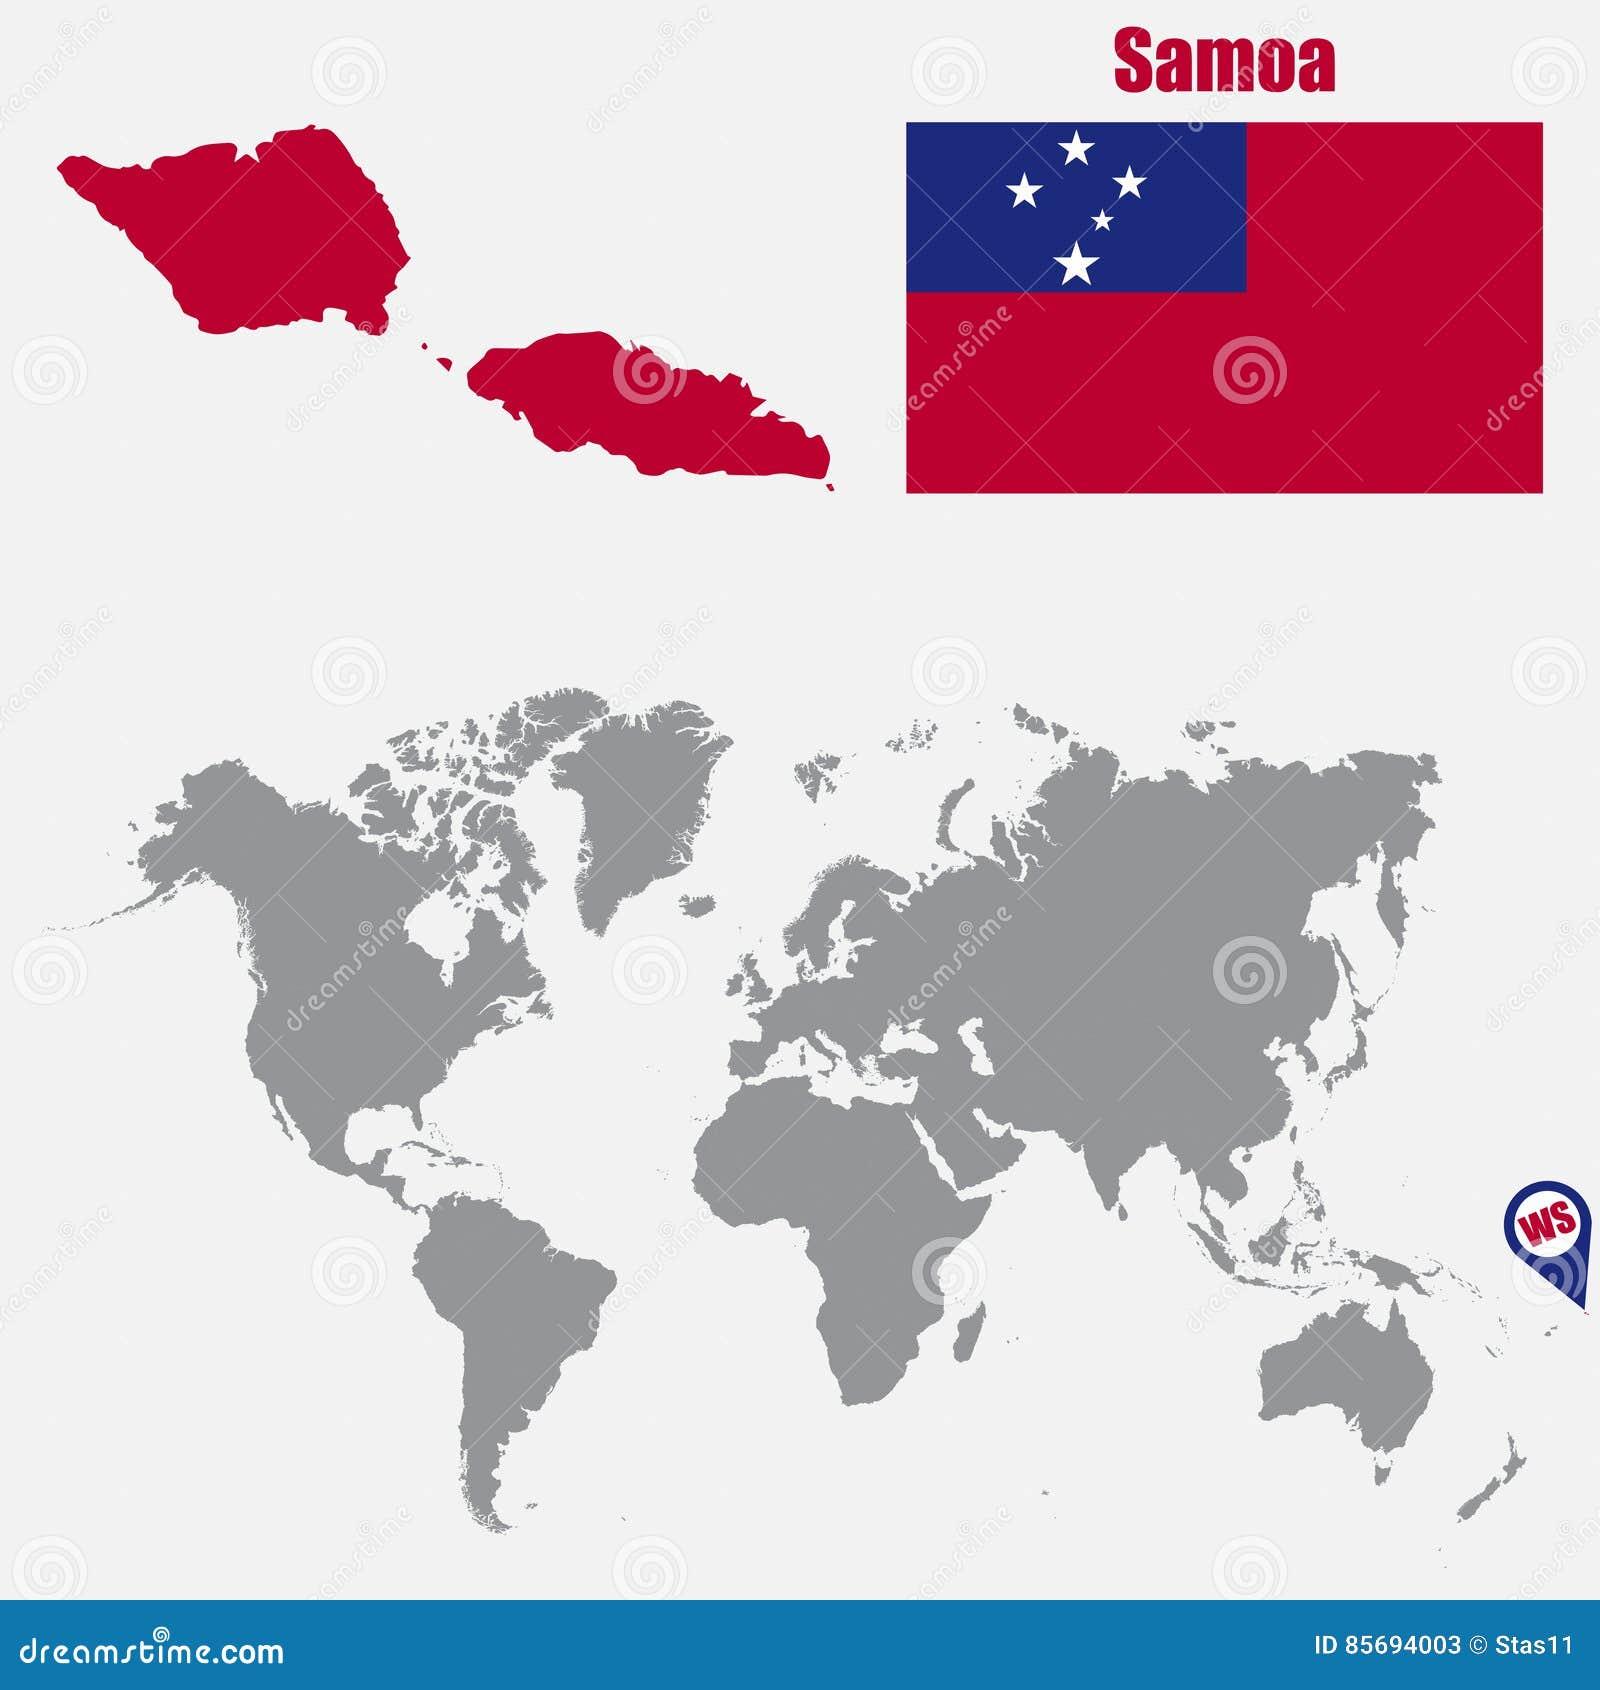 Maps Update 780323 Samoa Map World Samoa Map and Information – Samoa on World Map